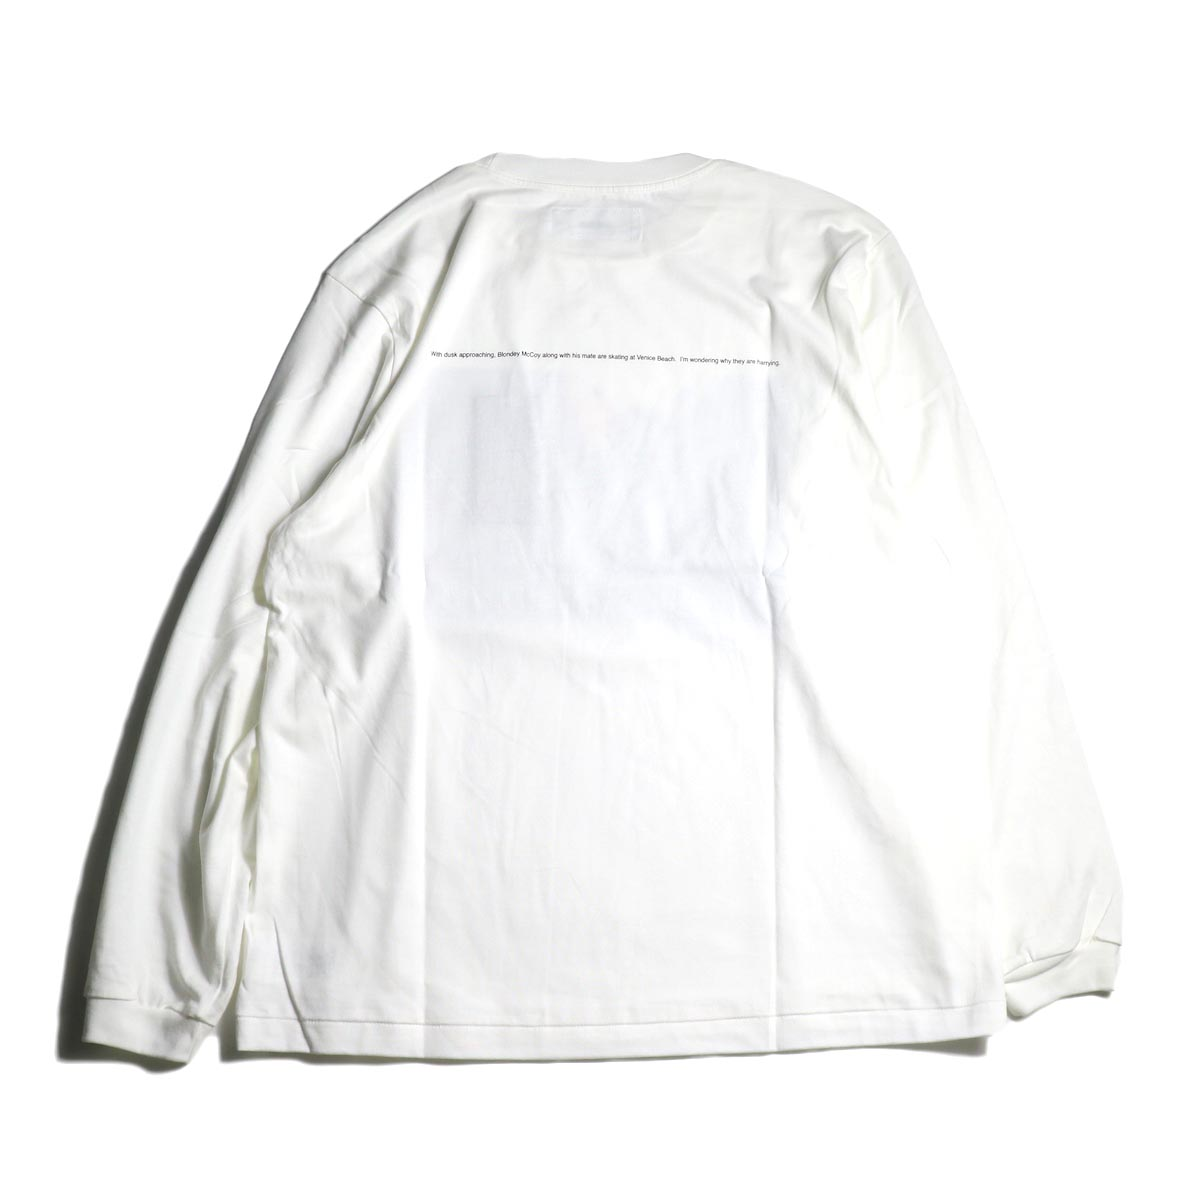 JANE SMITH / Print Tee (BLONDEY MCCOY L/S) -White背面